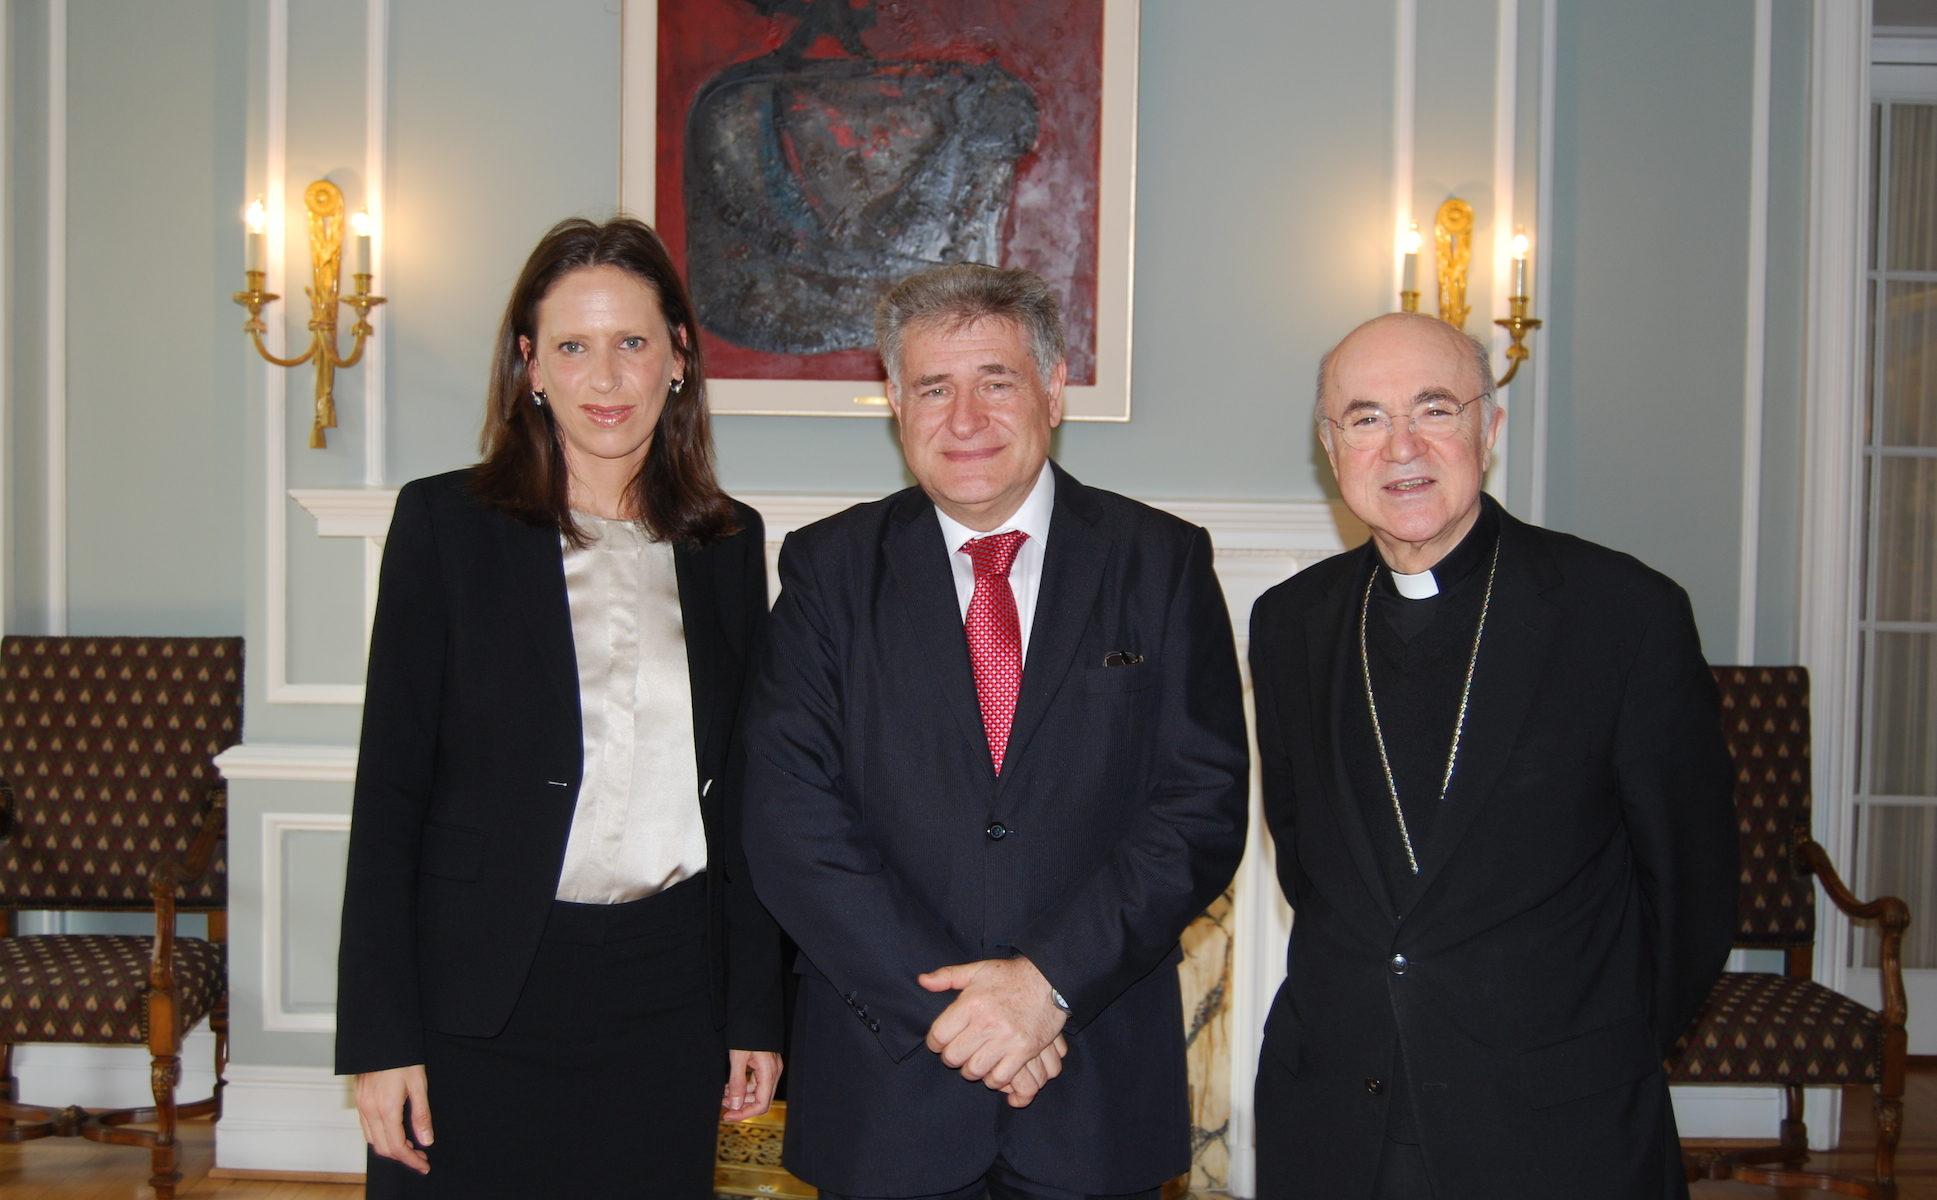 The pope's rabbi calls on Argentina to resolve AMIA - Jewish